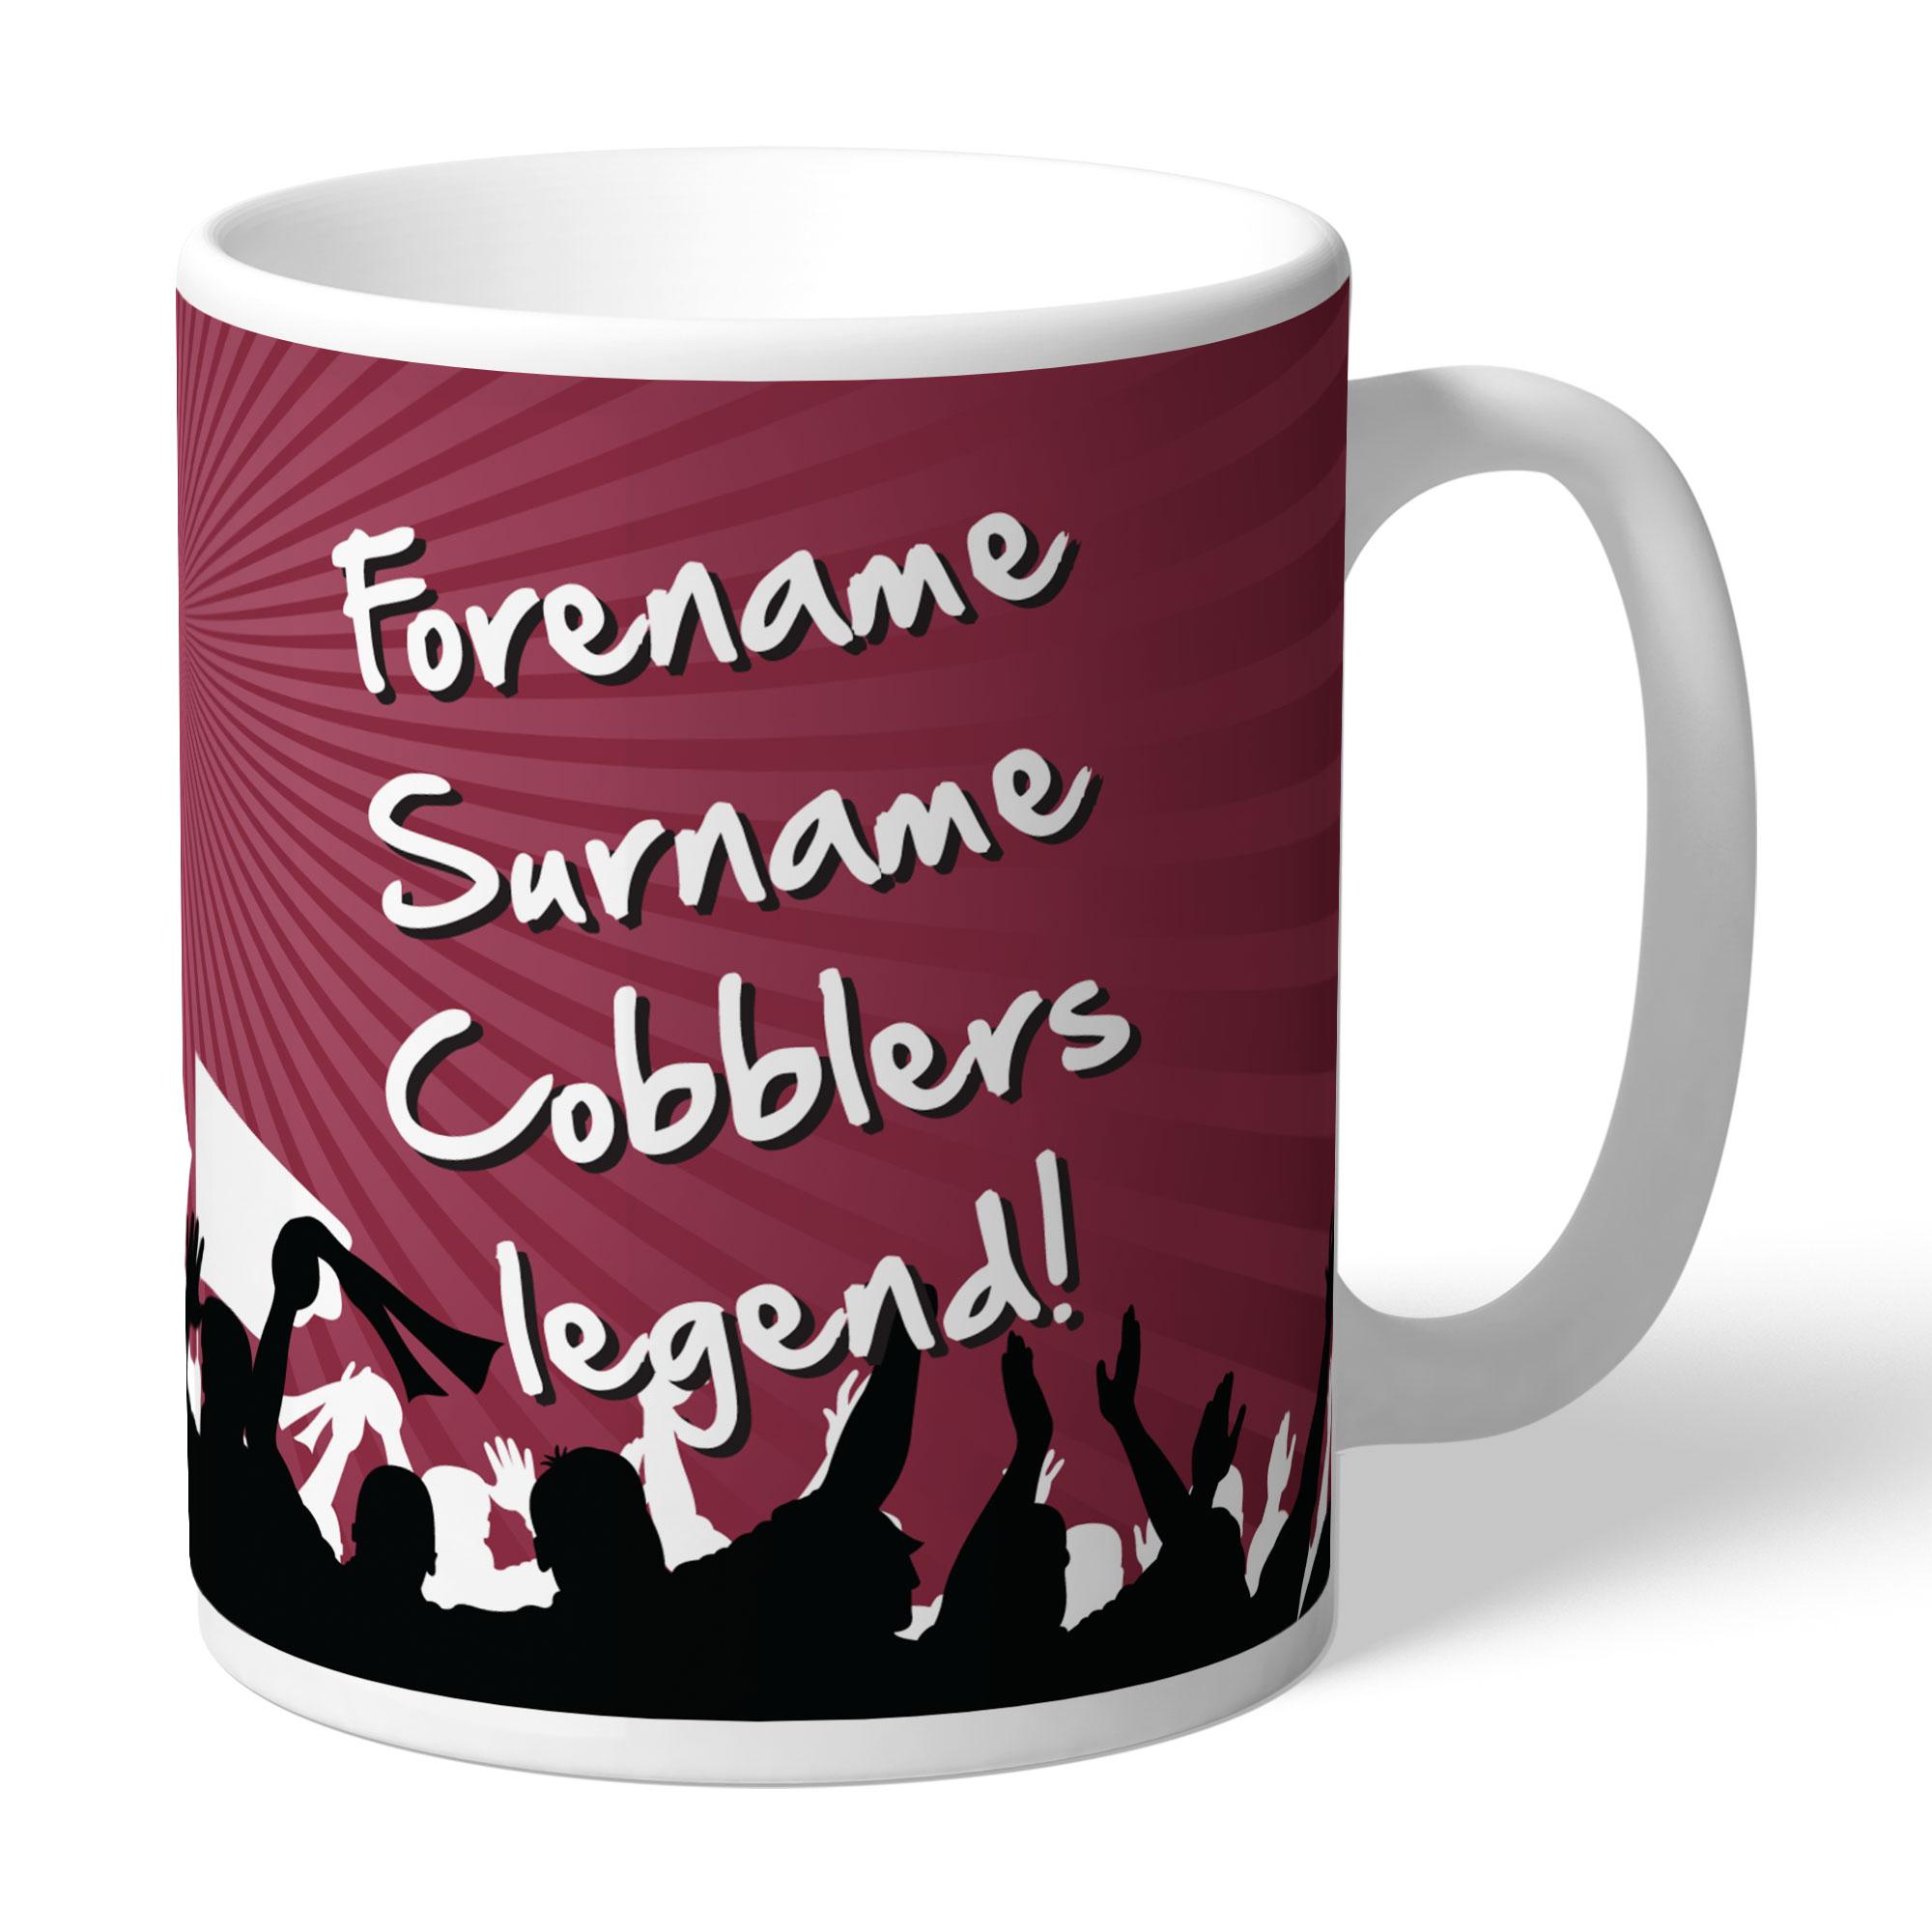 Northampton Town FC Legend Mug